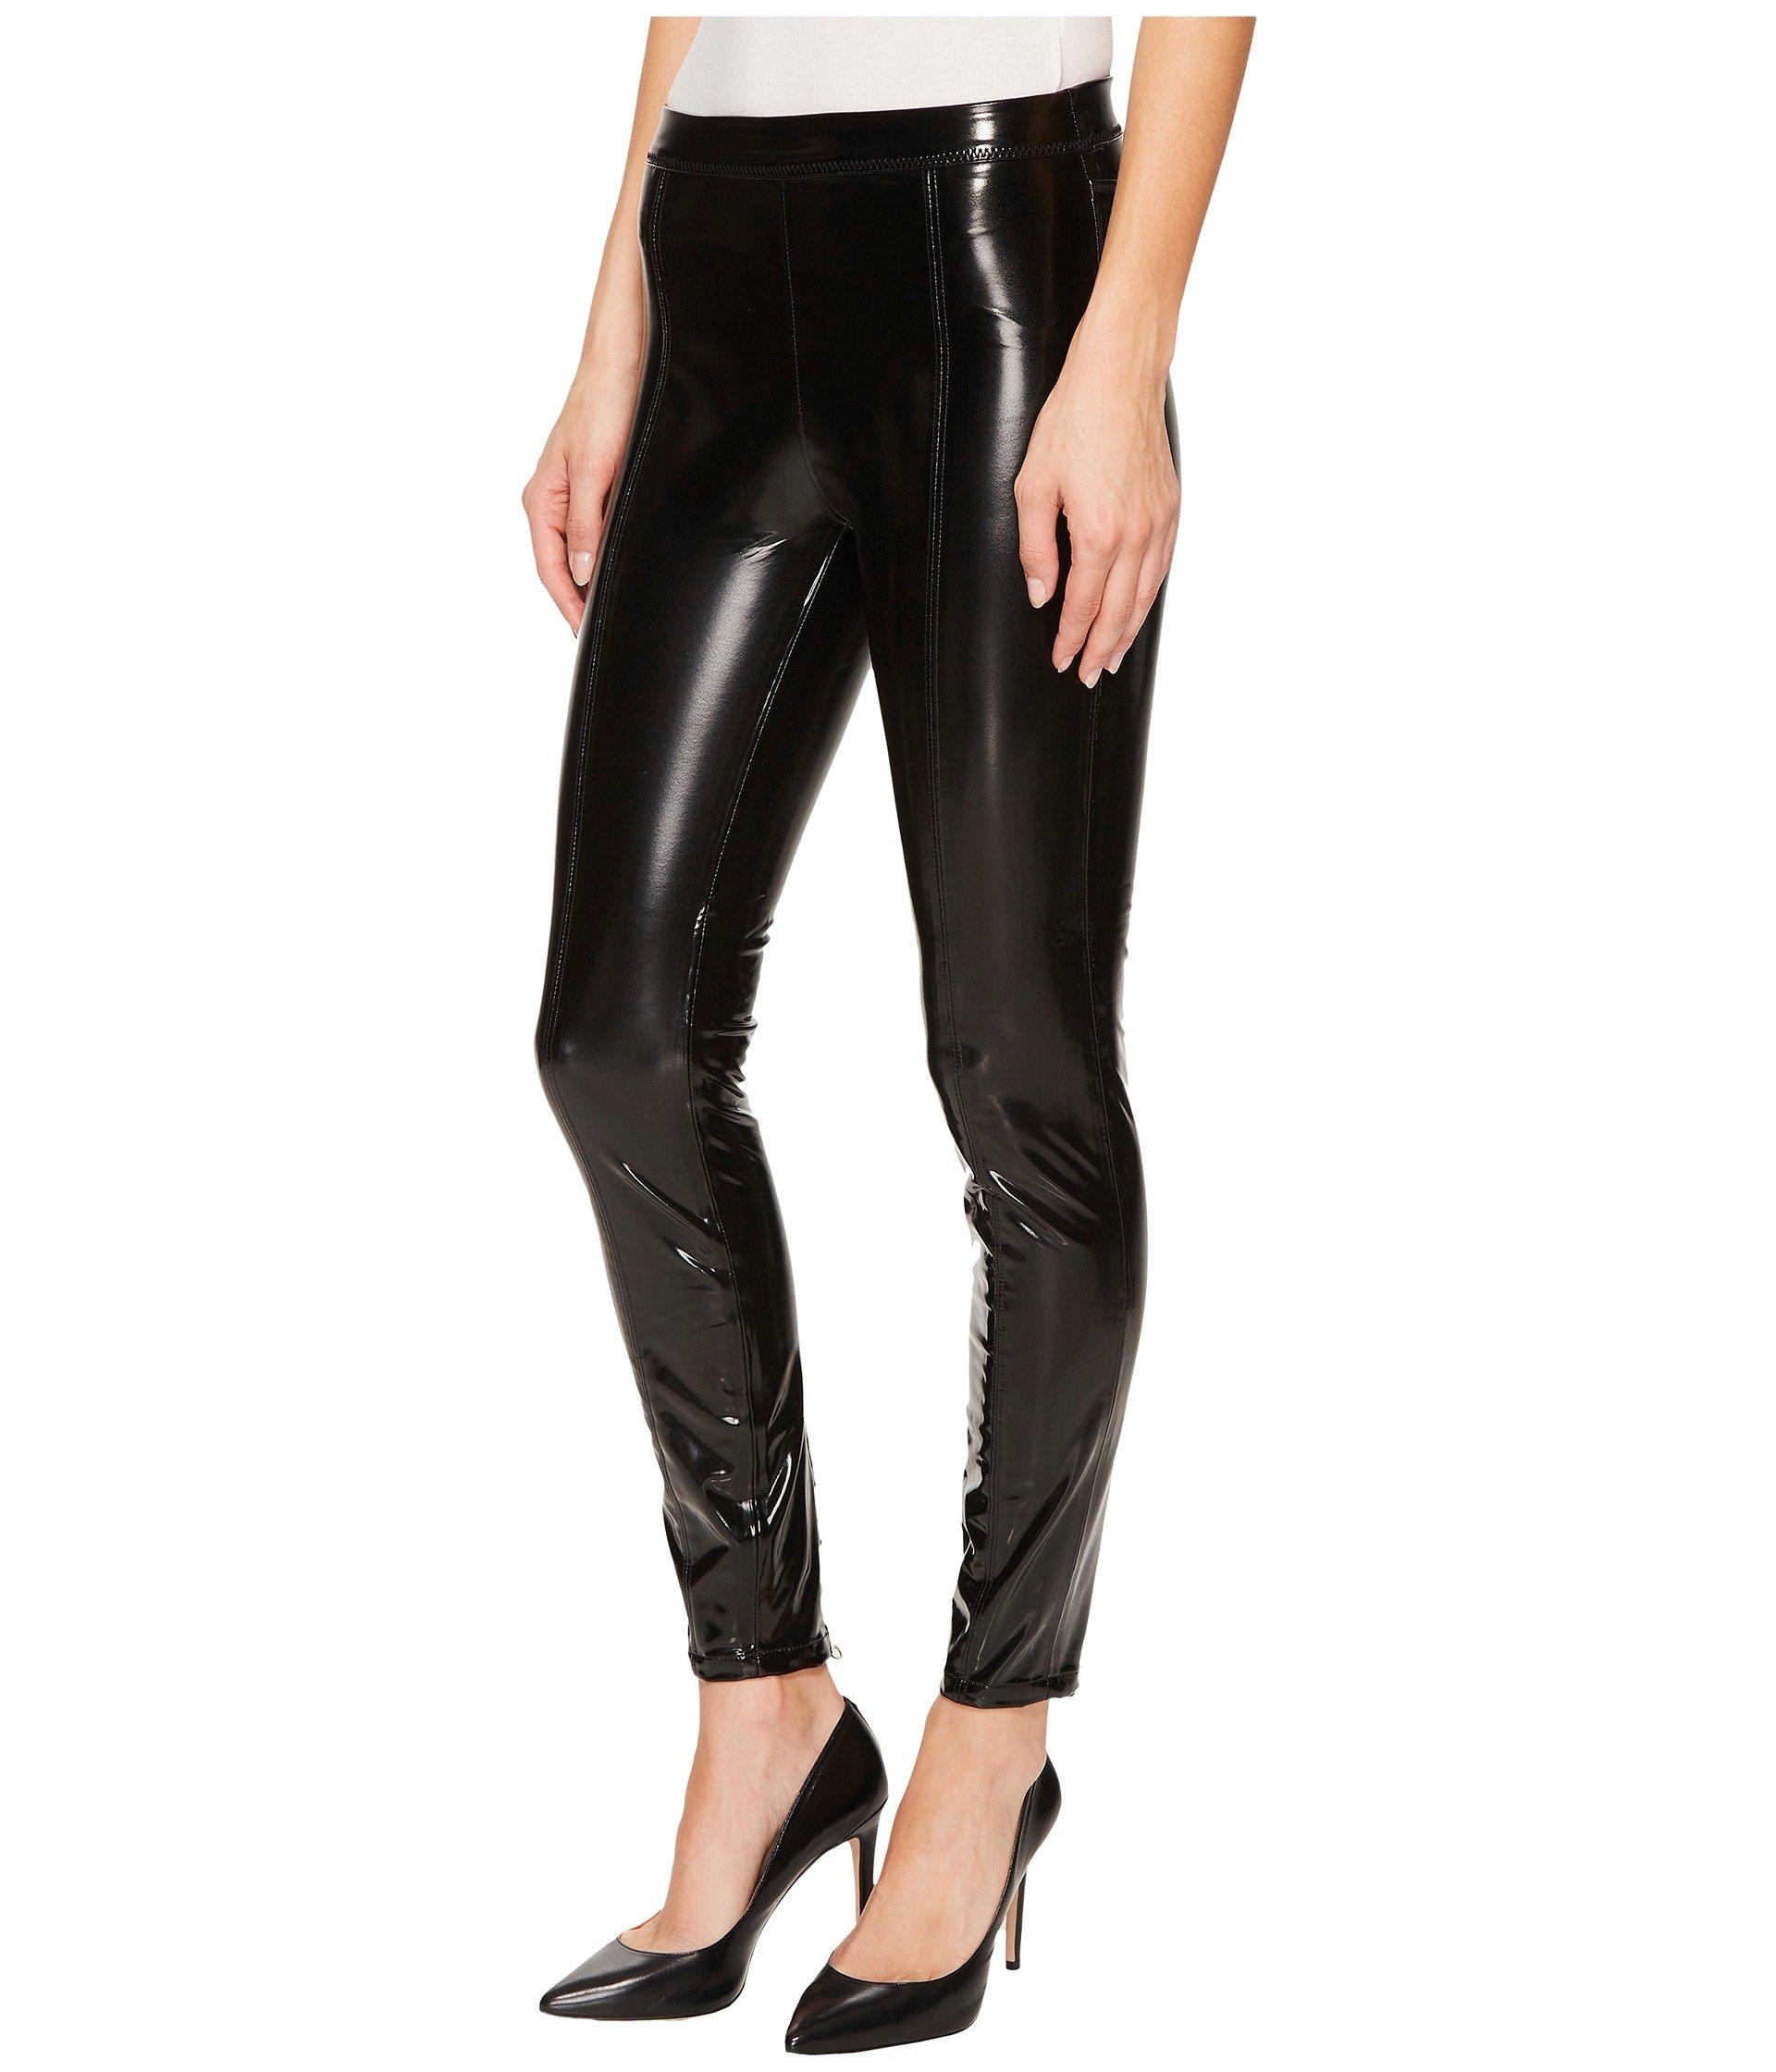 Blank Nyc Shiny Vegan Leather High Rise Pull On Leggings